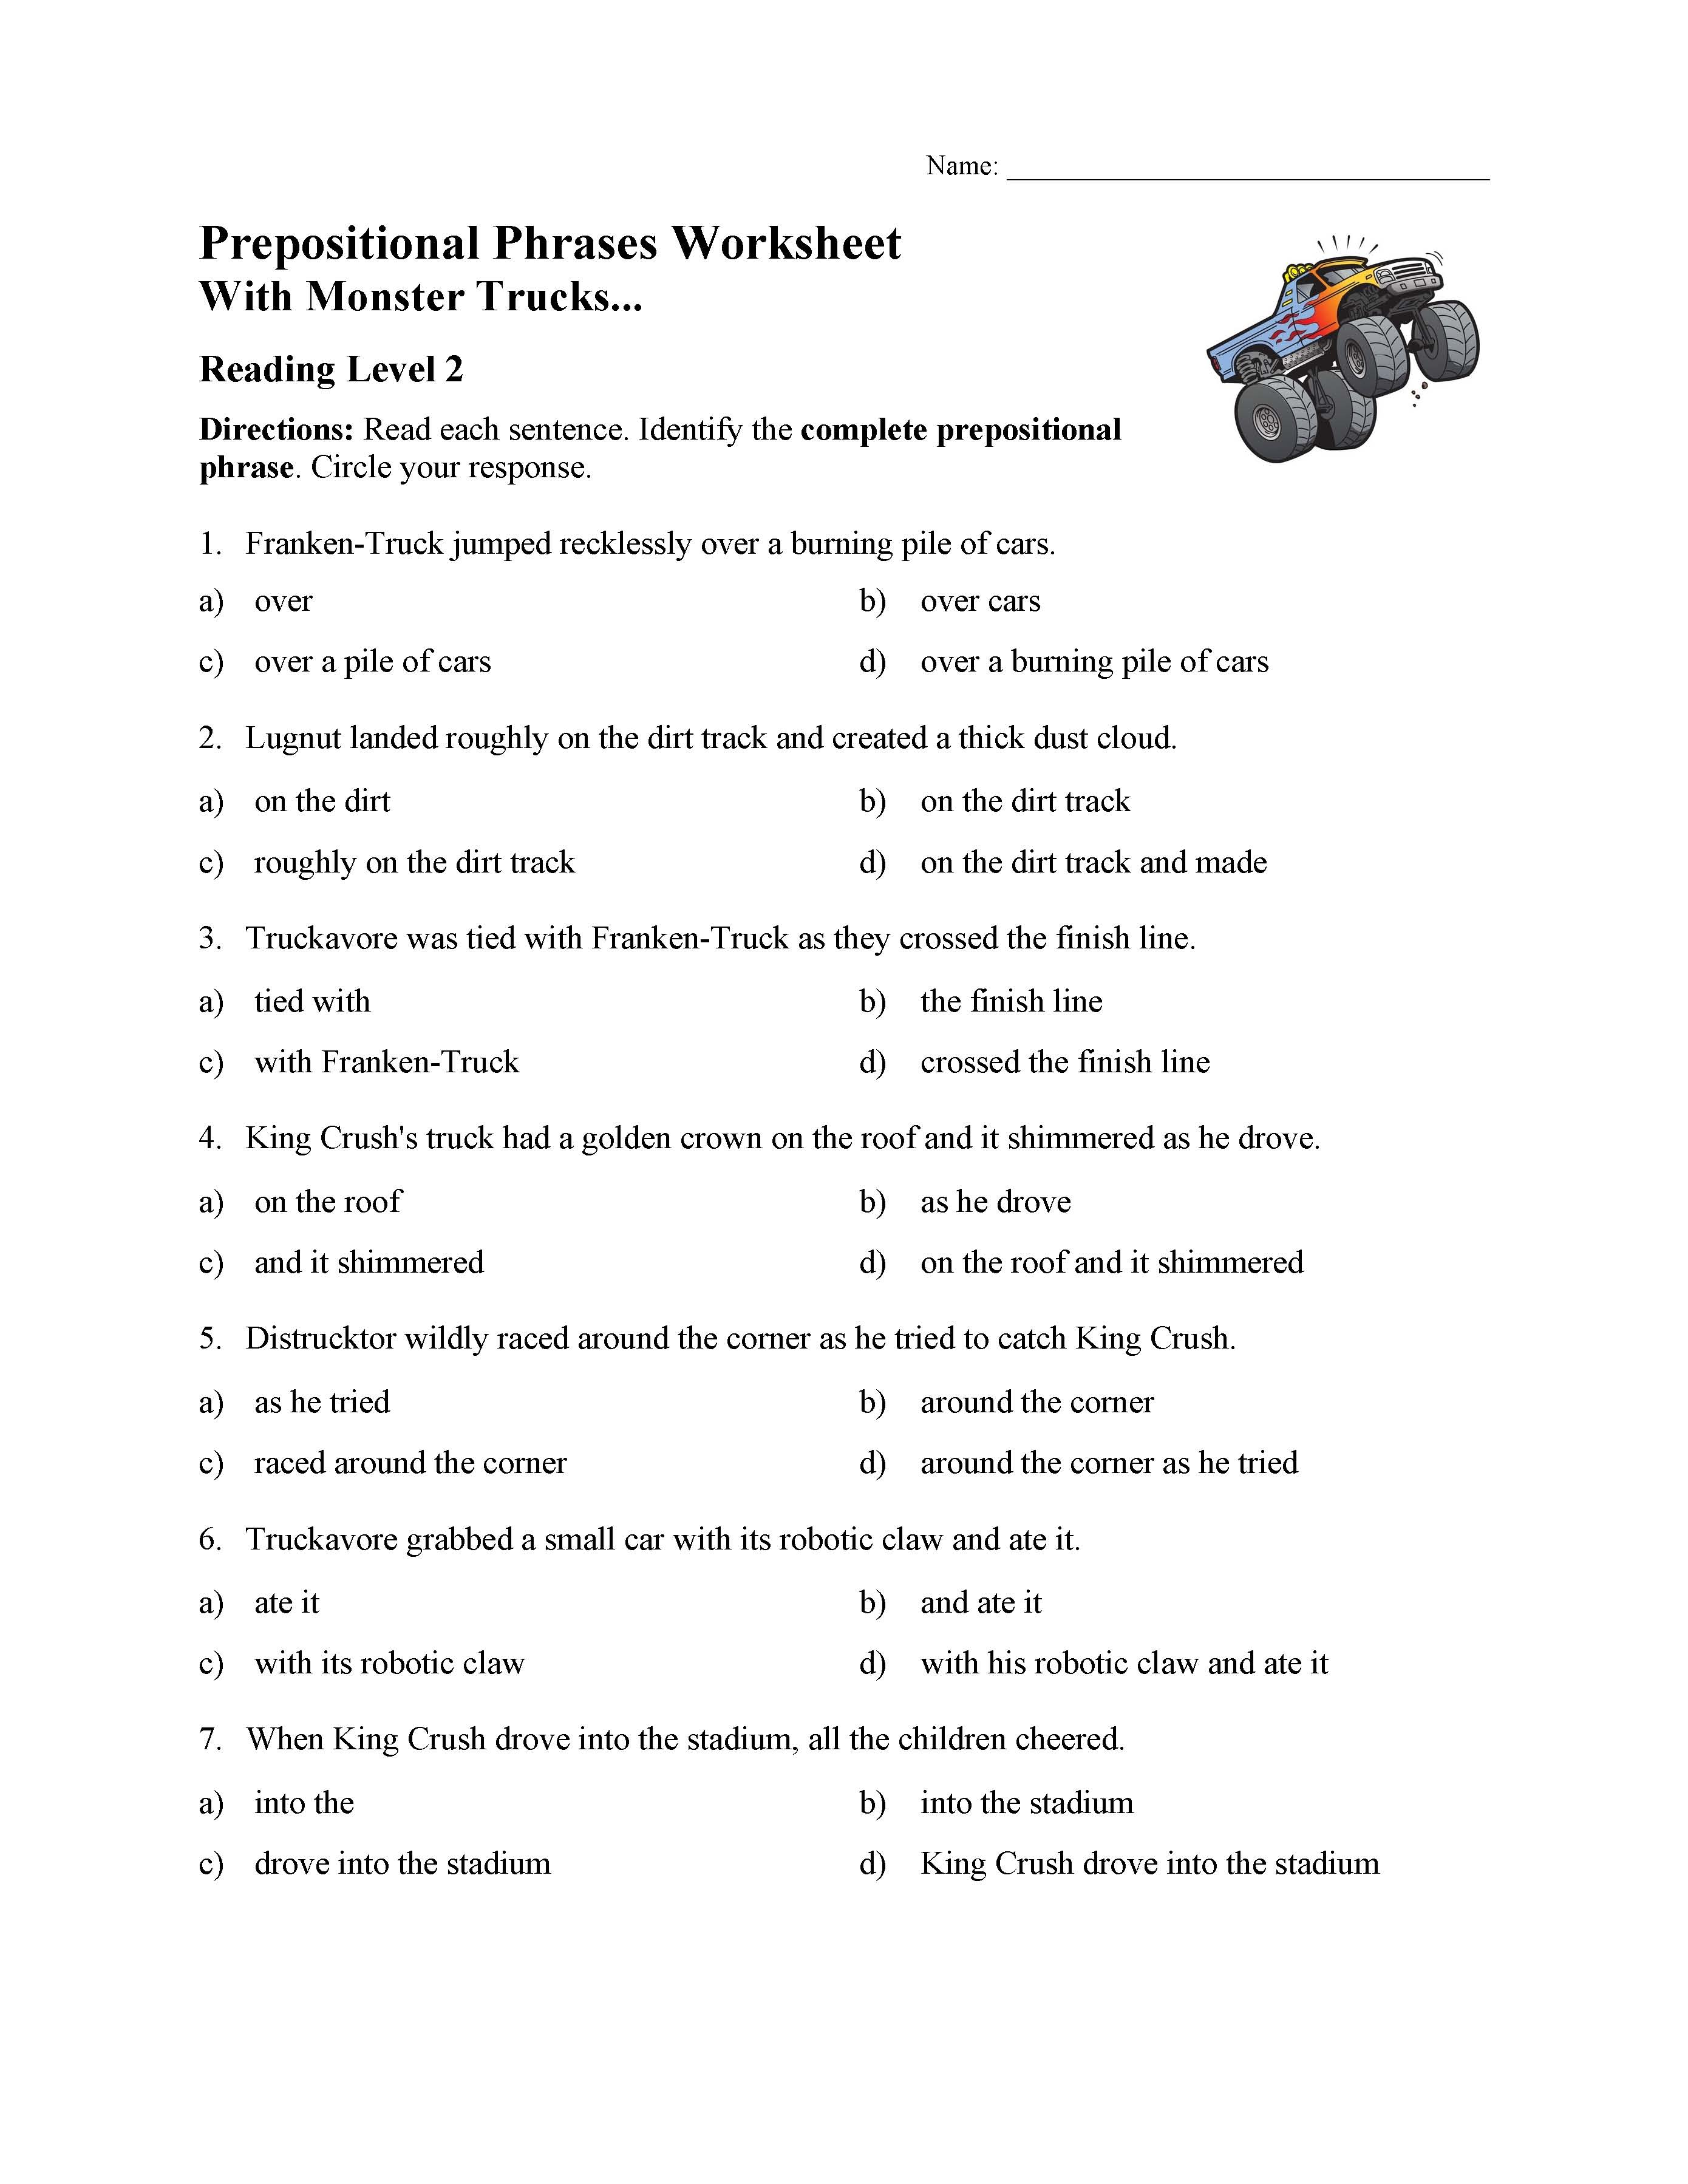 - Prepositional Phrases Worksheet 1 - Reading Level 2 Preview